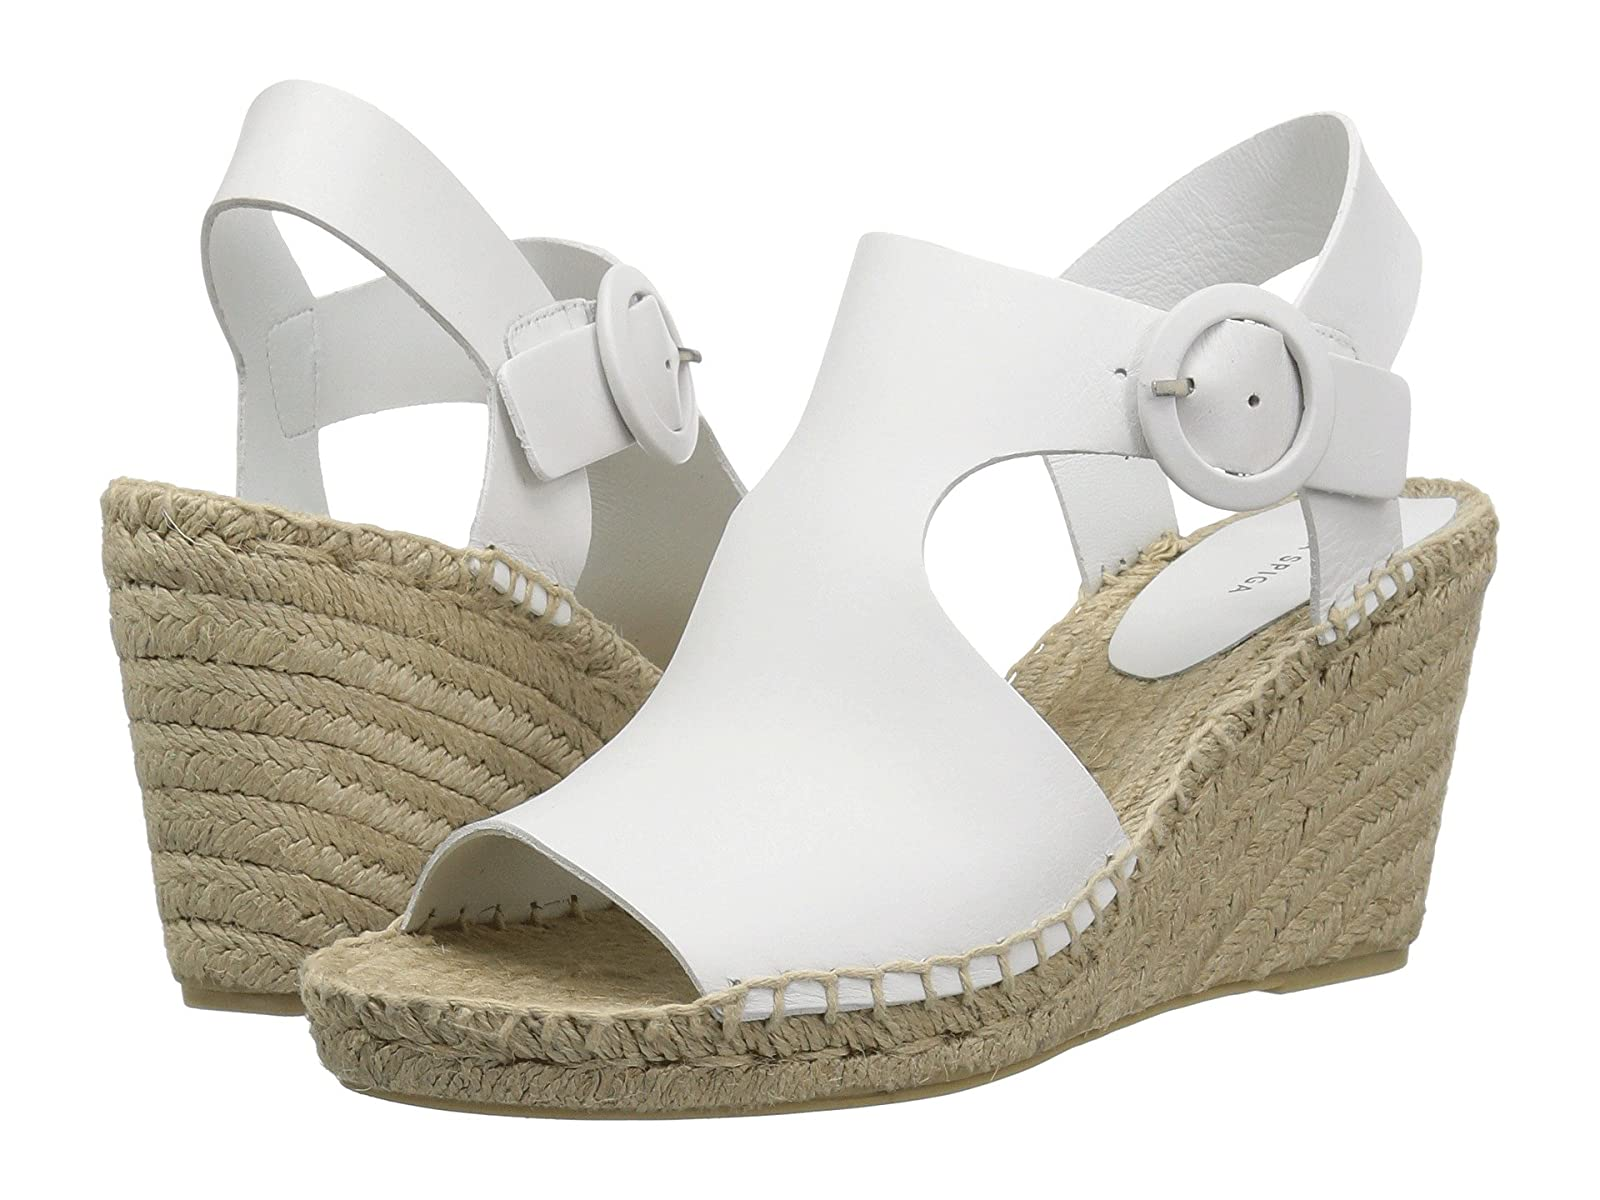 Via Spiga NolanAtmospheric grades have affordable shoes